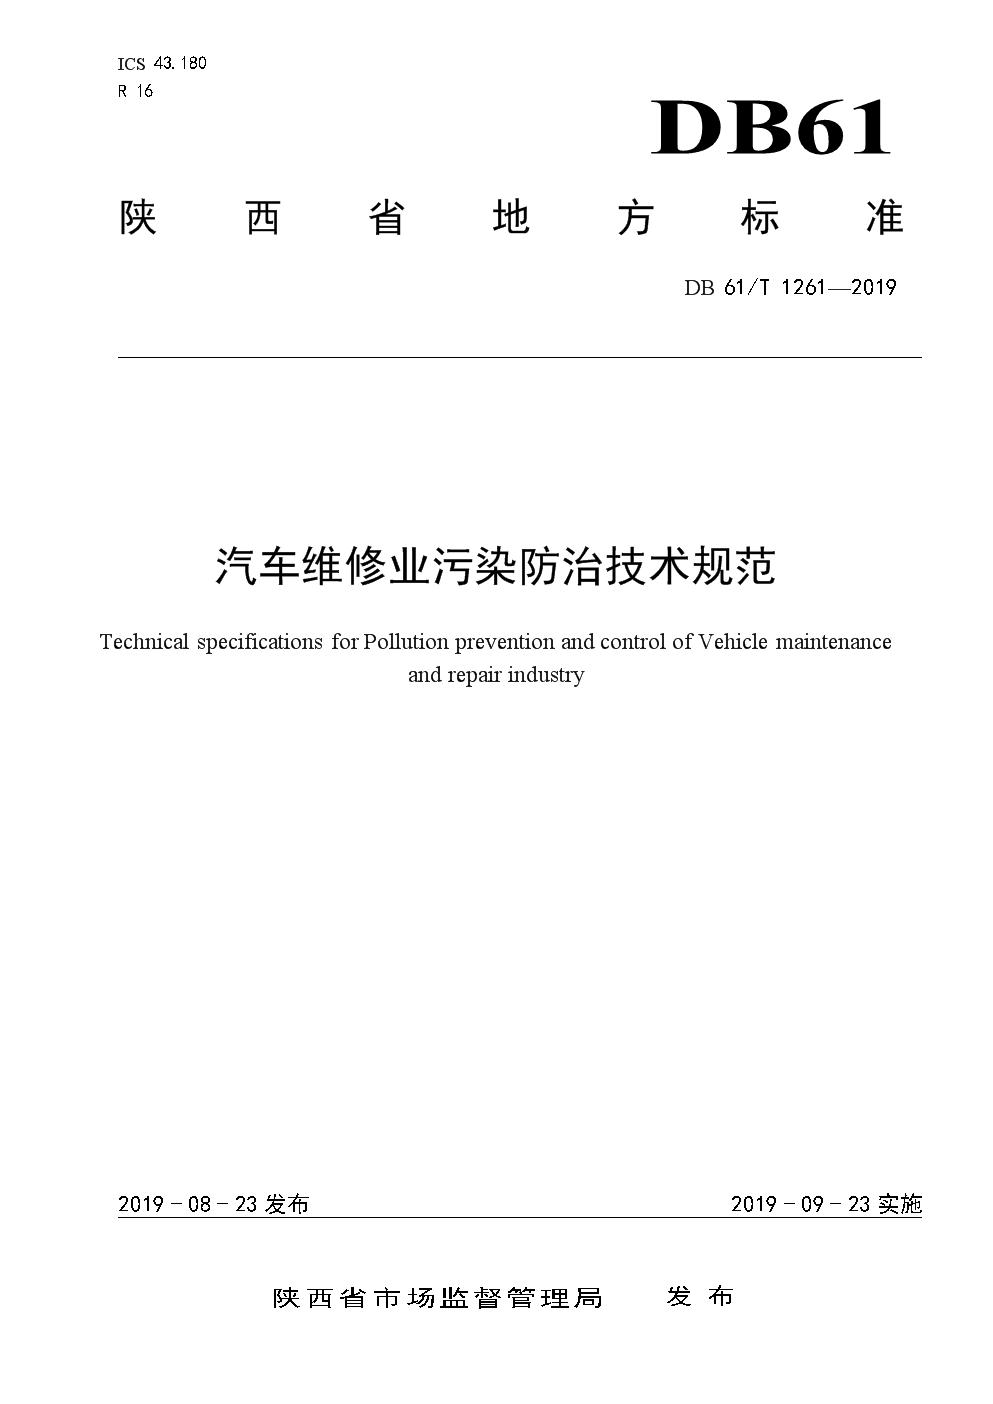 DB61∕T 1261-2019 -汽车维修业污染防治技术规范.docx